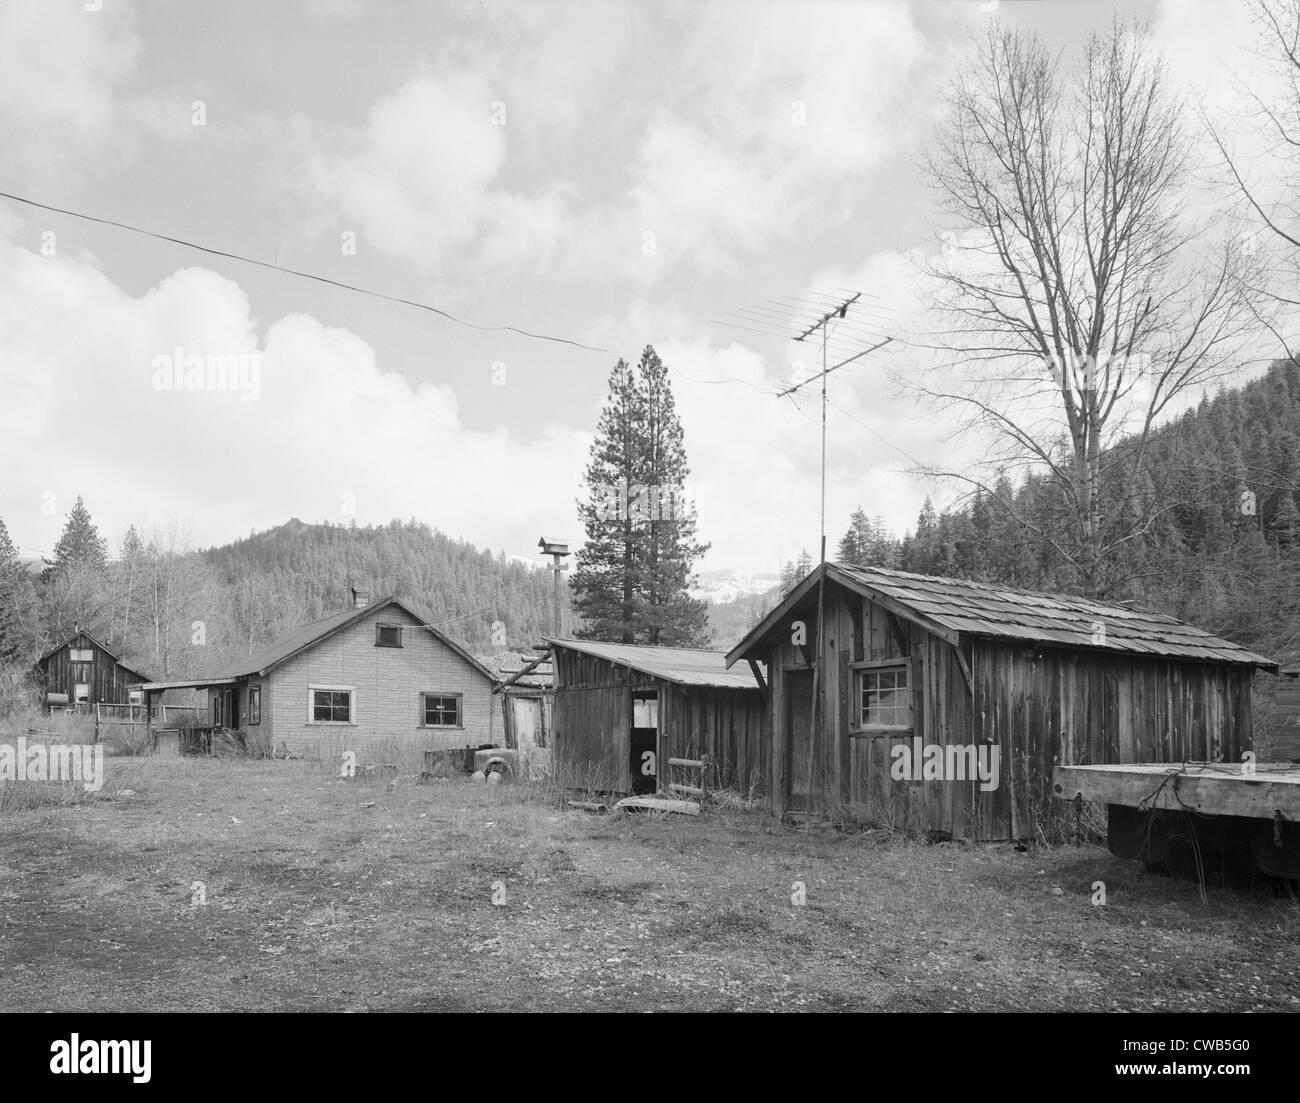 Taxidermy Shop, Liberty Historic District, Route 2, Cle Elum, Liberty, Kittitas County, Washington, photograph, - Stock Image